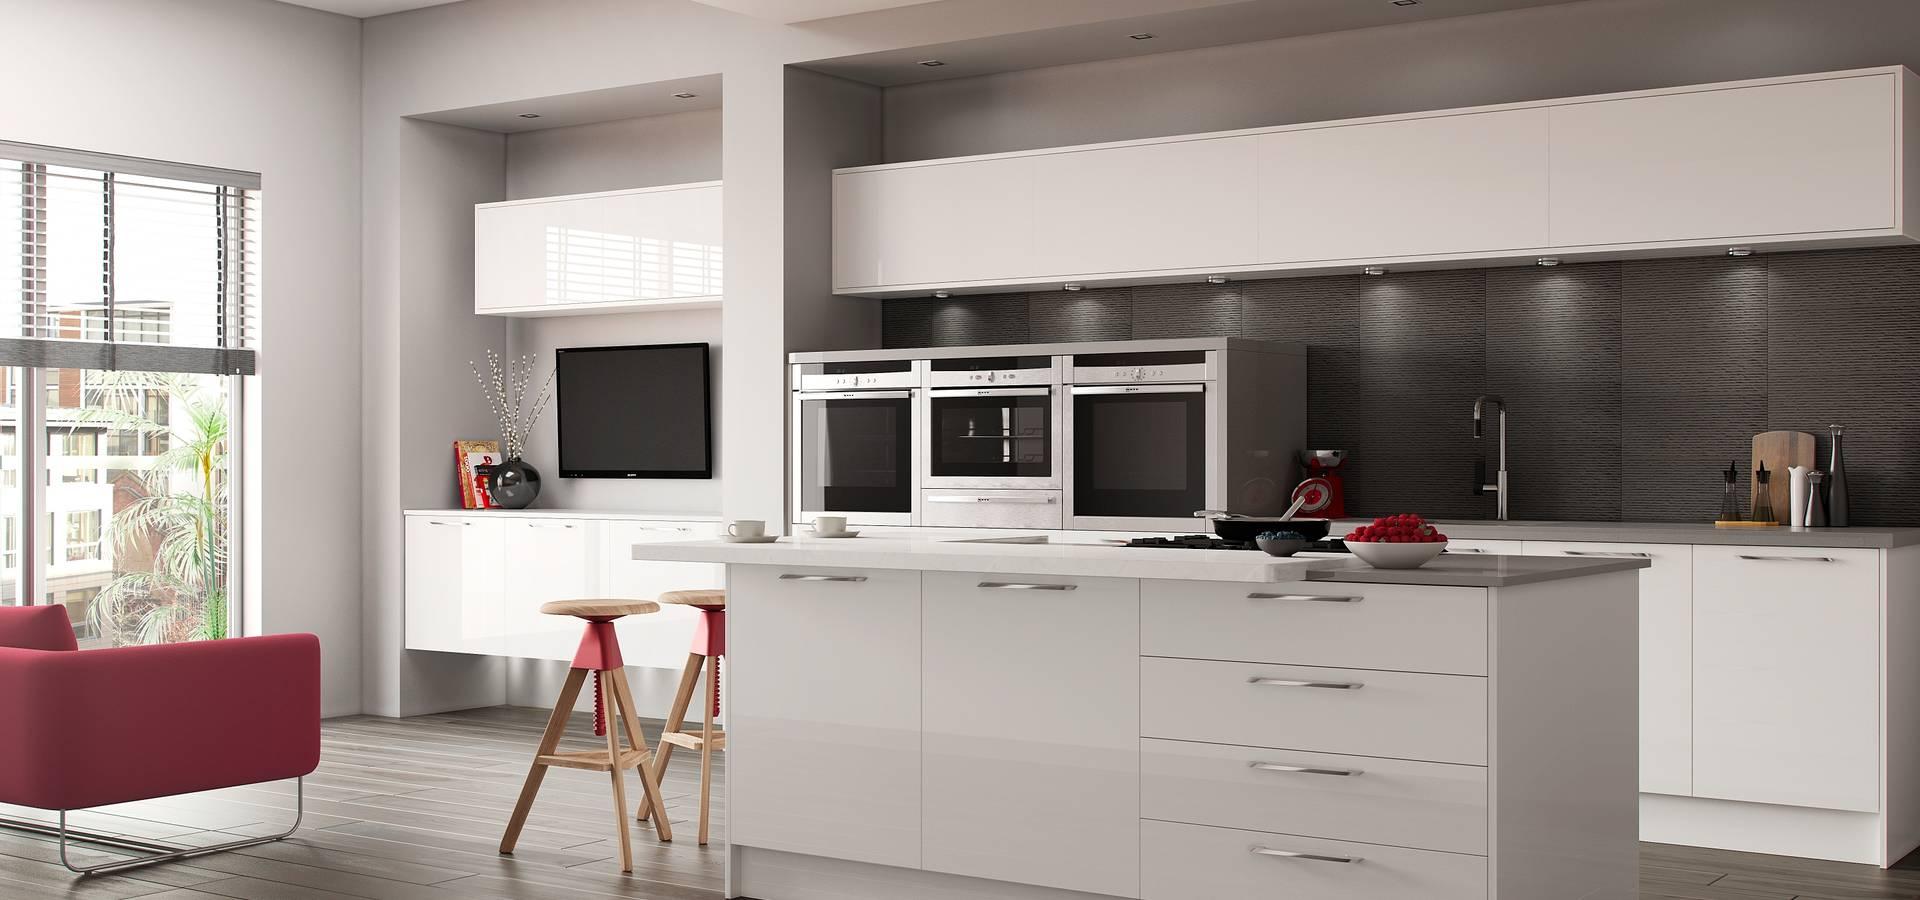 Sigma 3 Kitchens